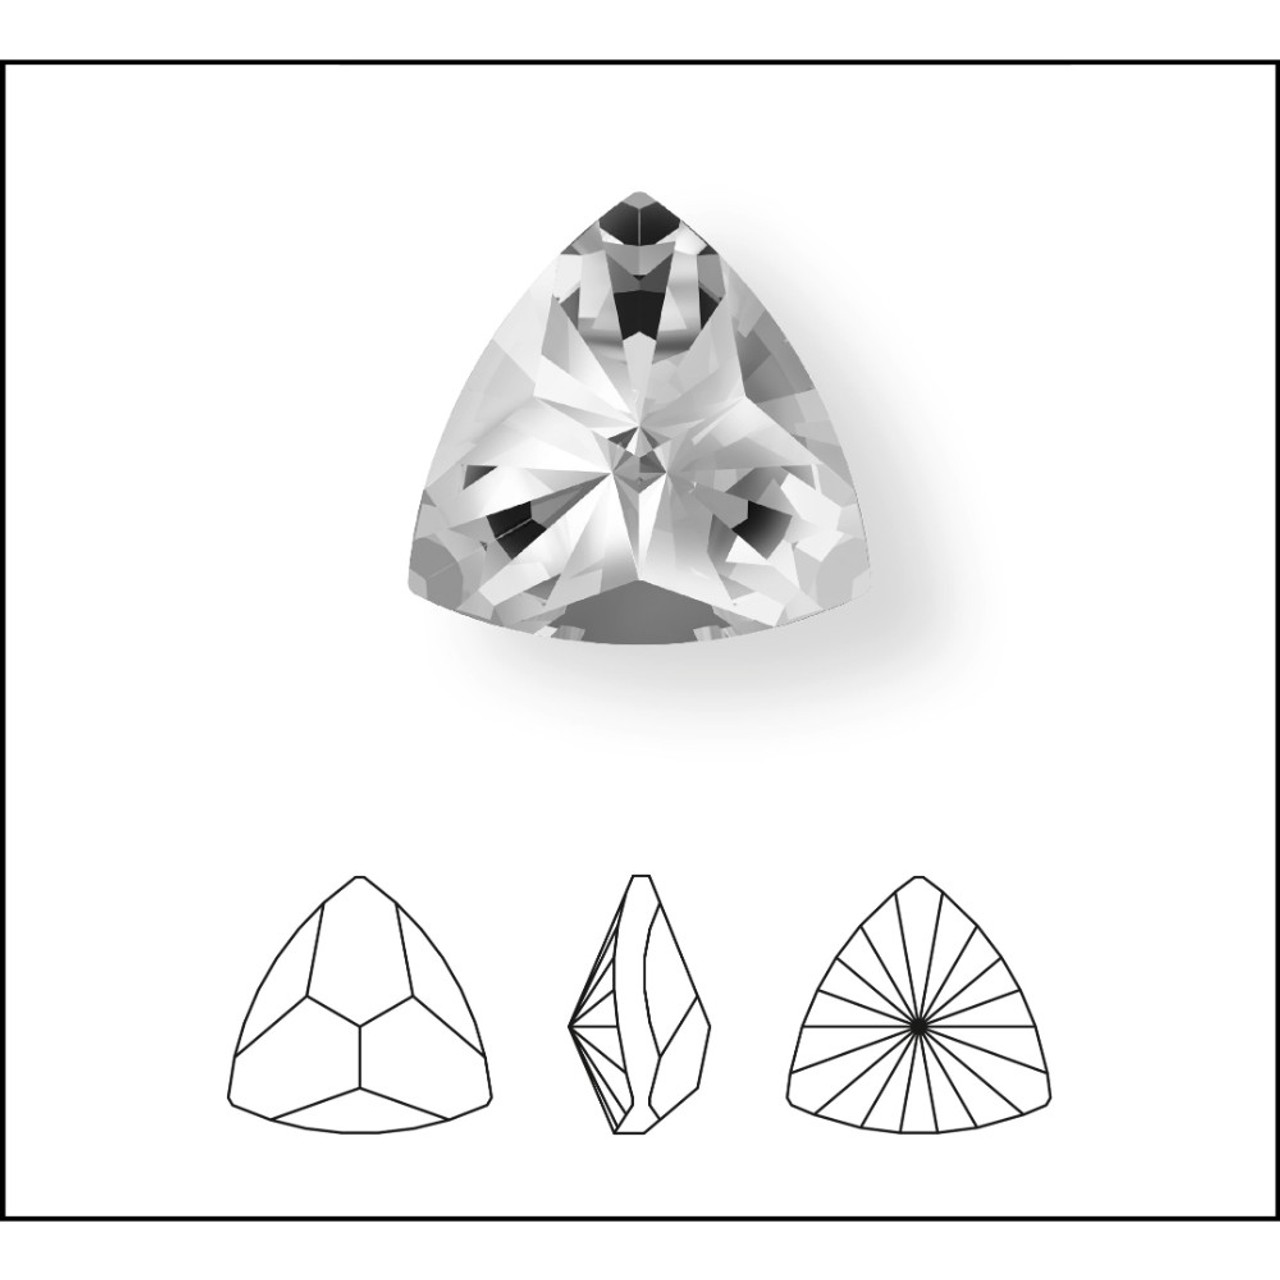 d399072e3e7 Swarovski 4799 20mm Kaleidoscope Triangle Fancy Stones Emerald ...